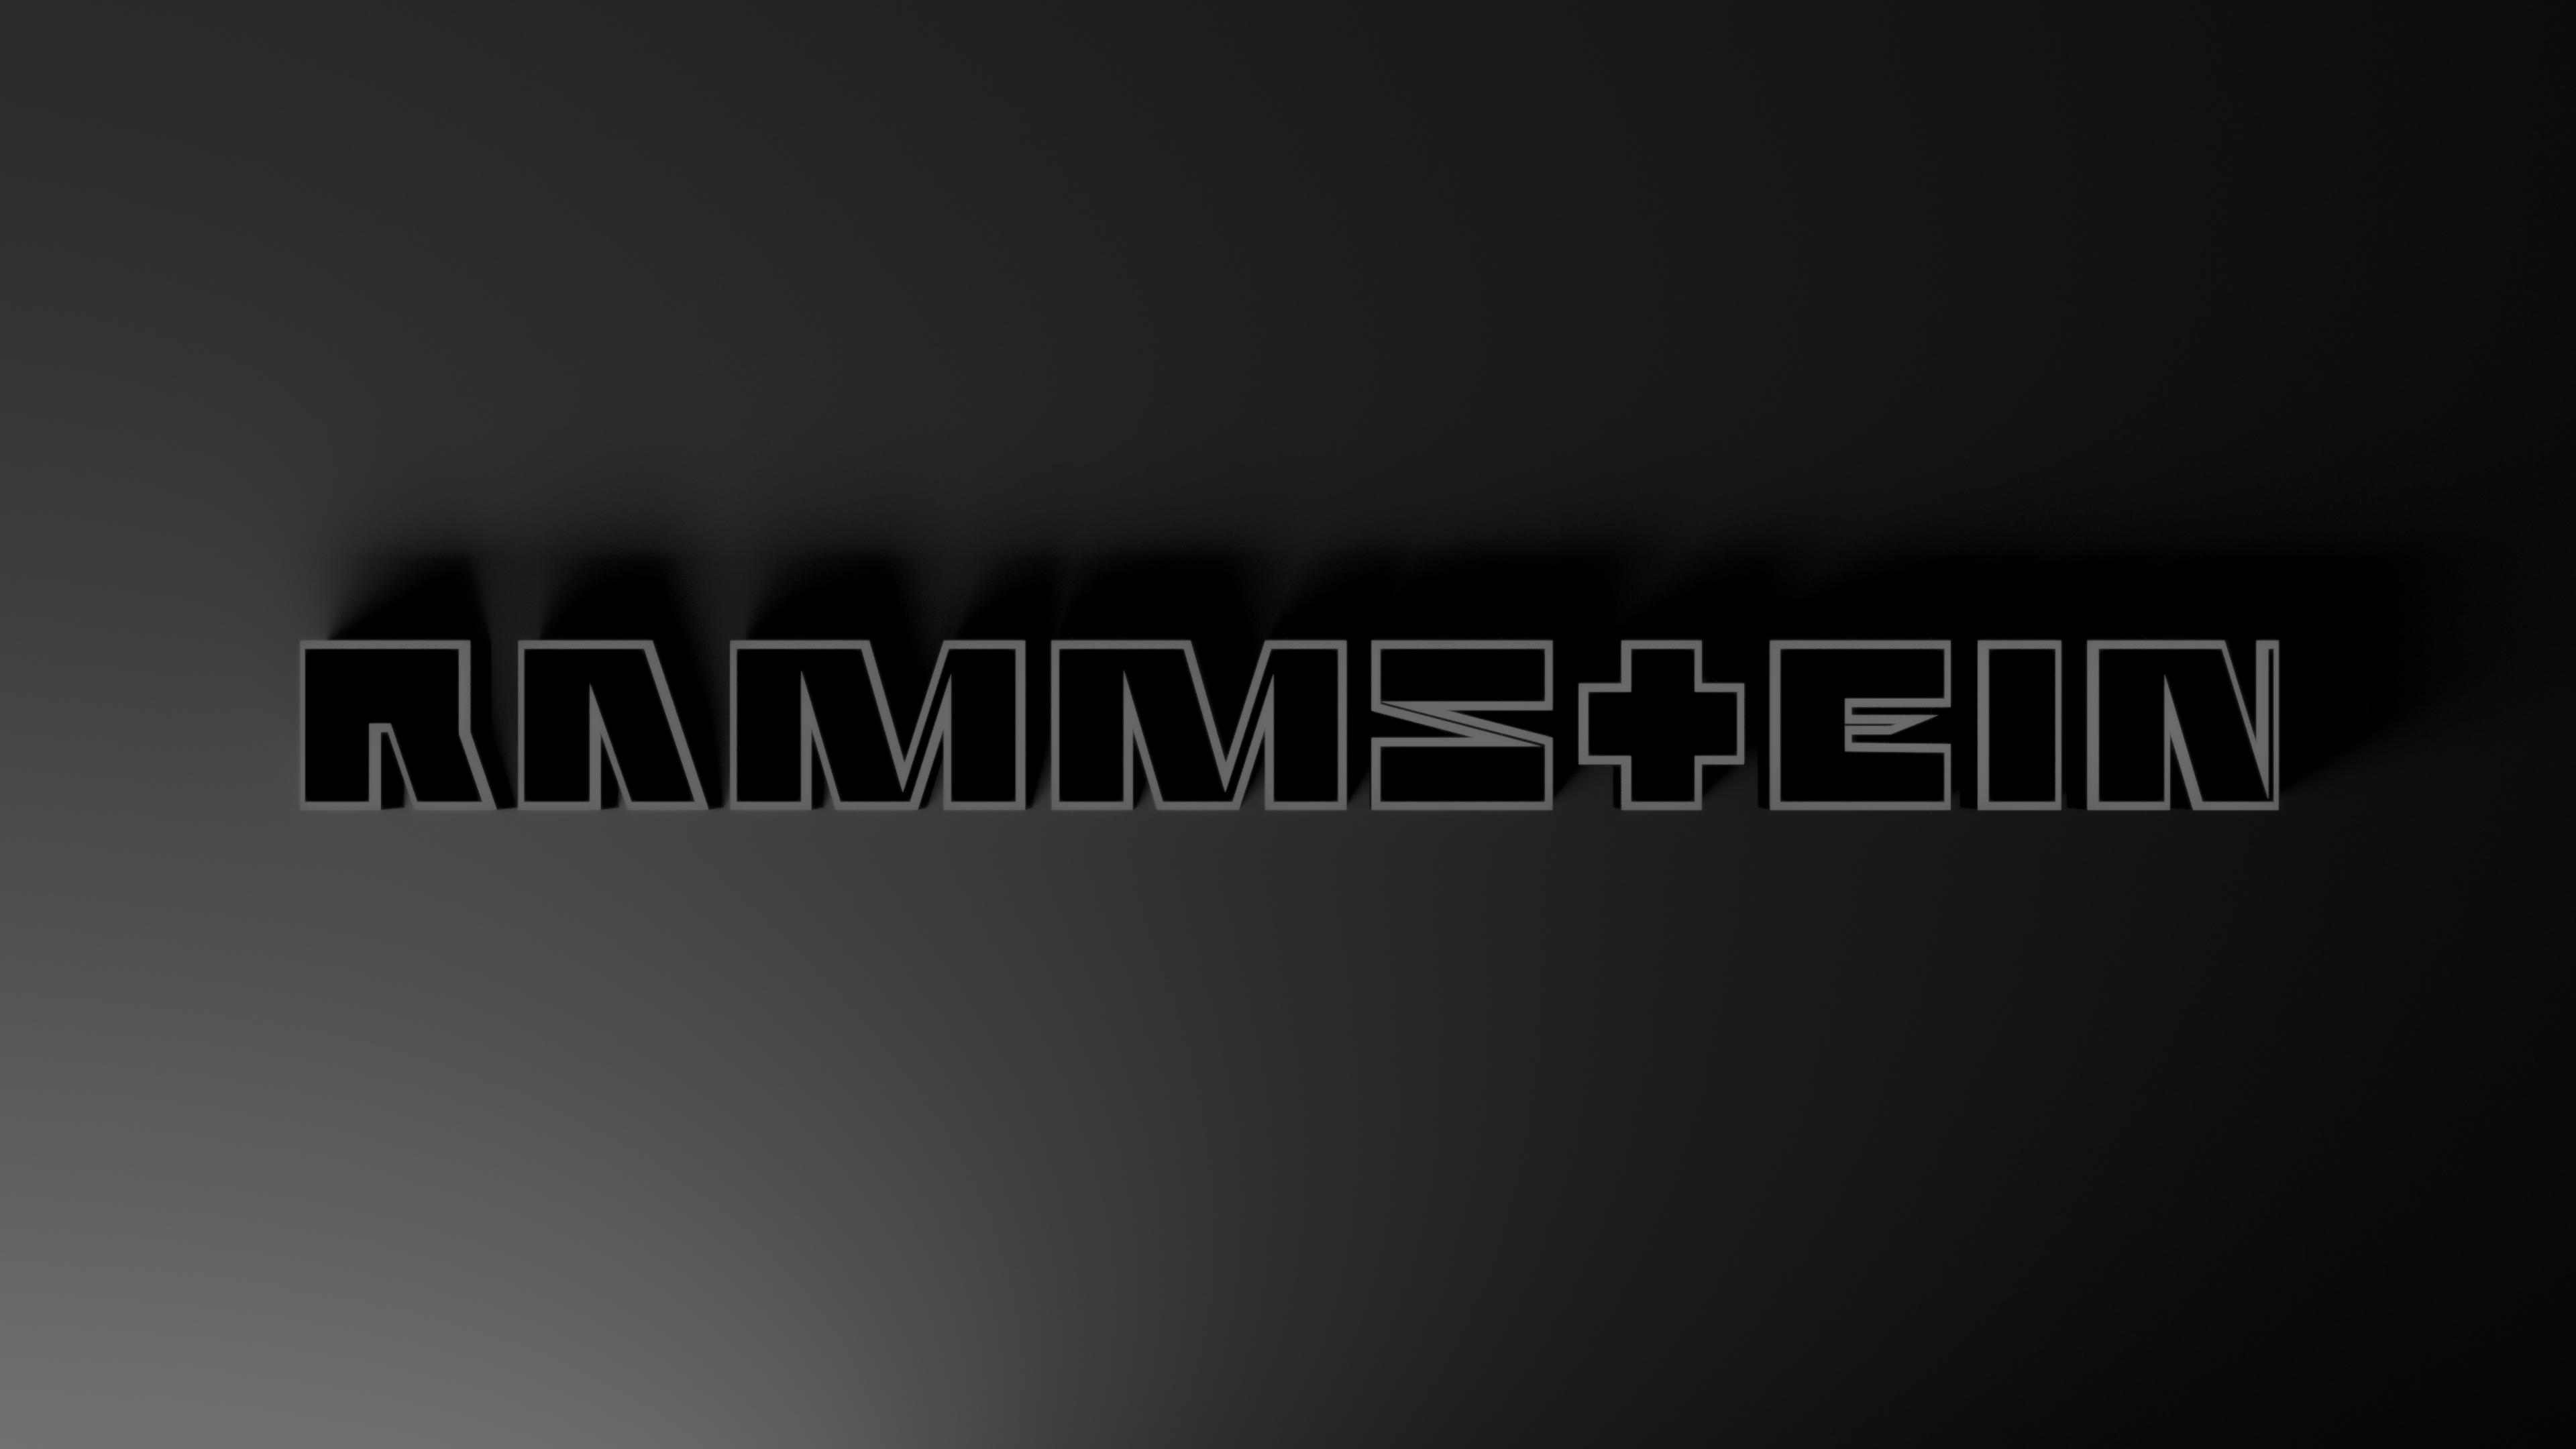 Rammstein Name Logo 4k Ultra HD Wallpaper